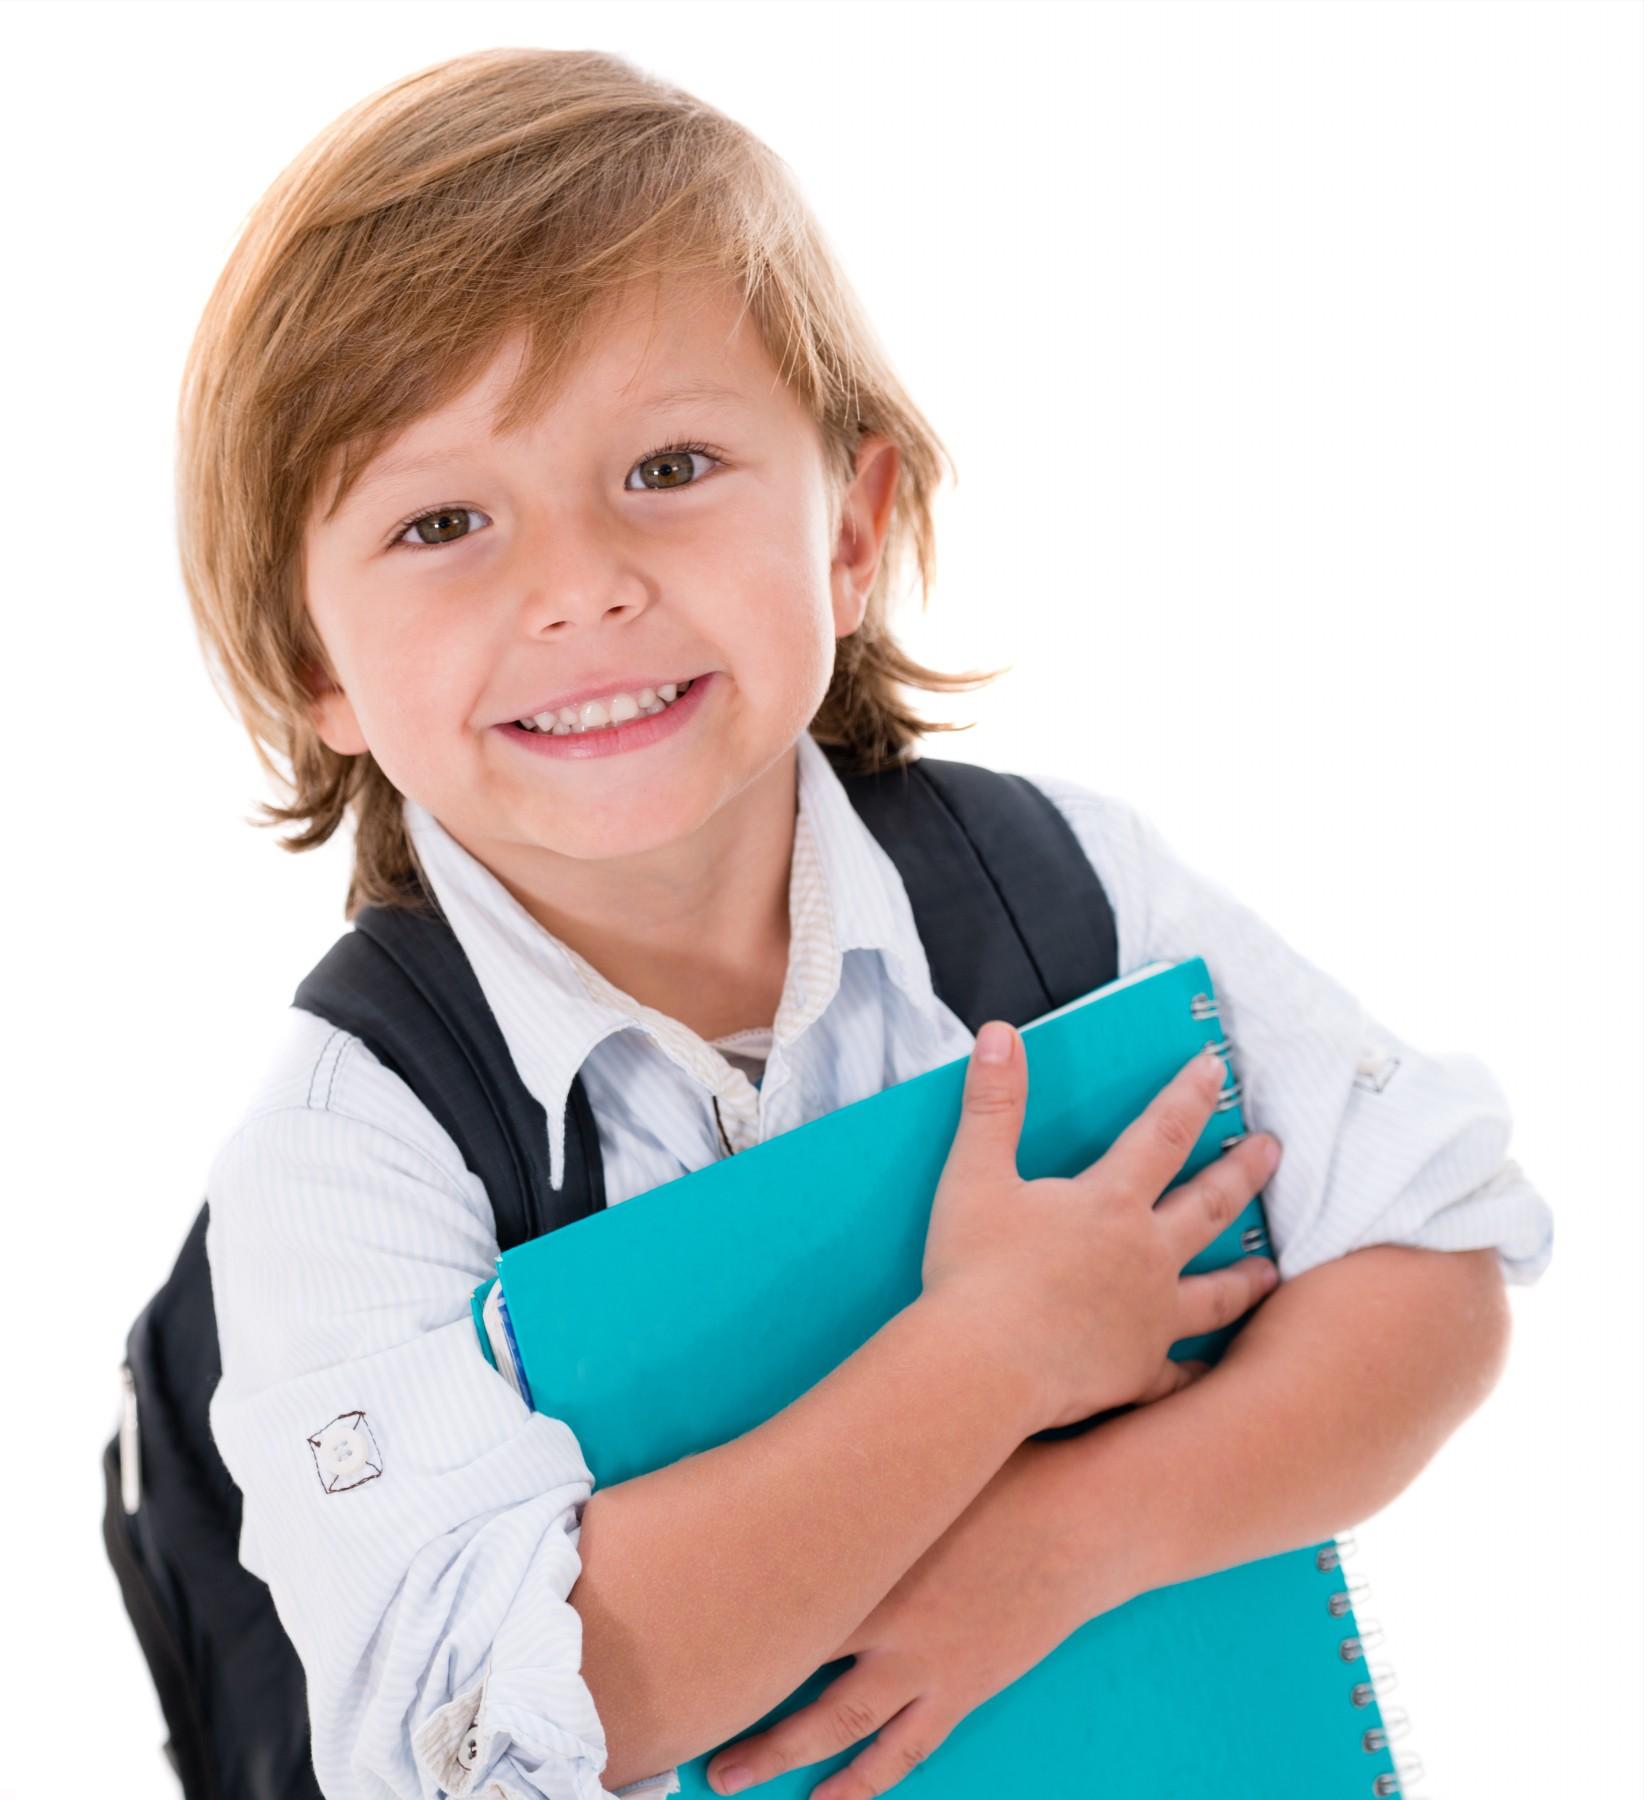 Kids-Boys-Girls-in-Schools-8 • Sensation Station